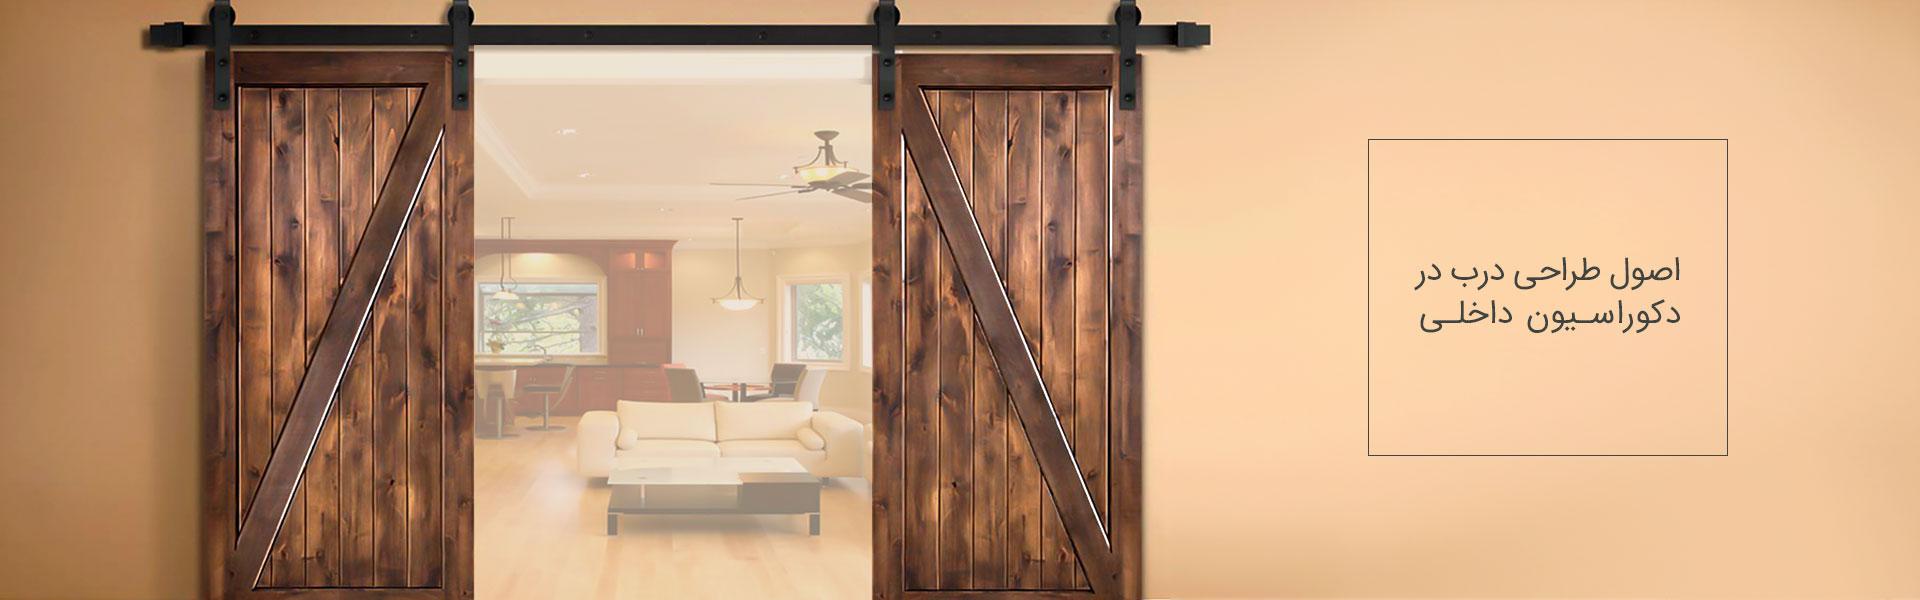 decorasion osul tarahi darb3 - اصول طراحی درب در دکوراسیون داخلی